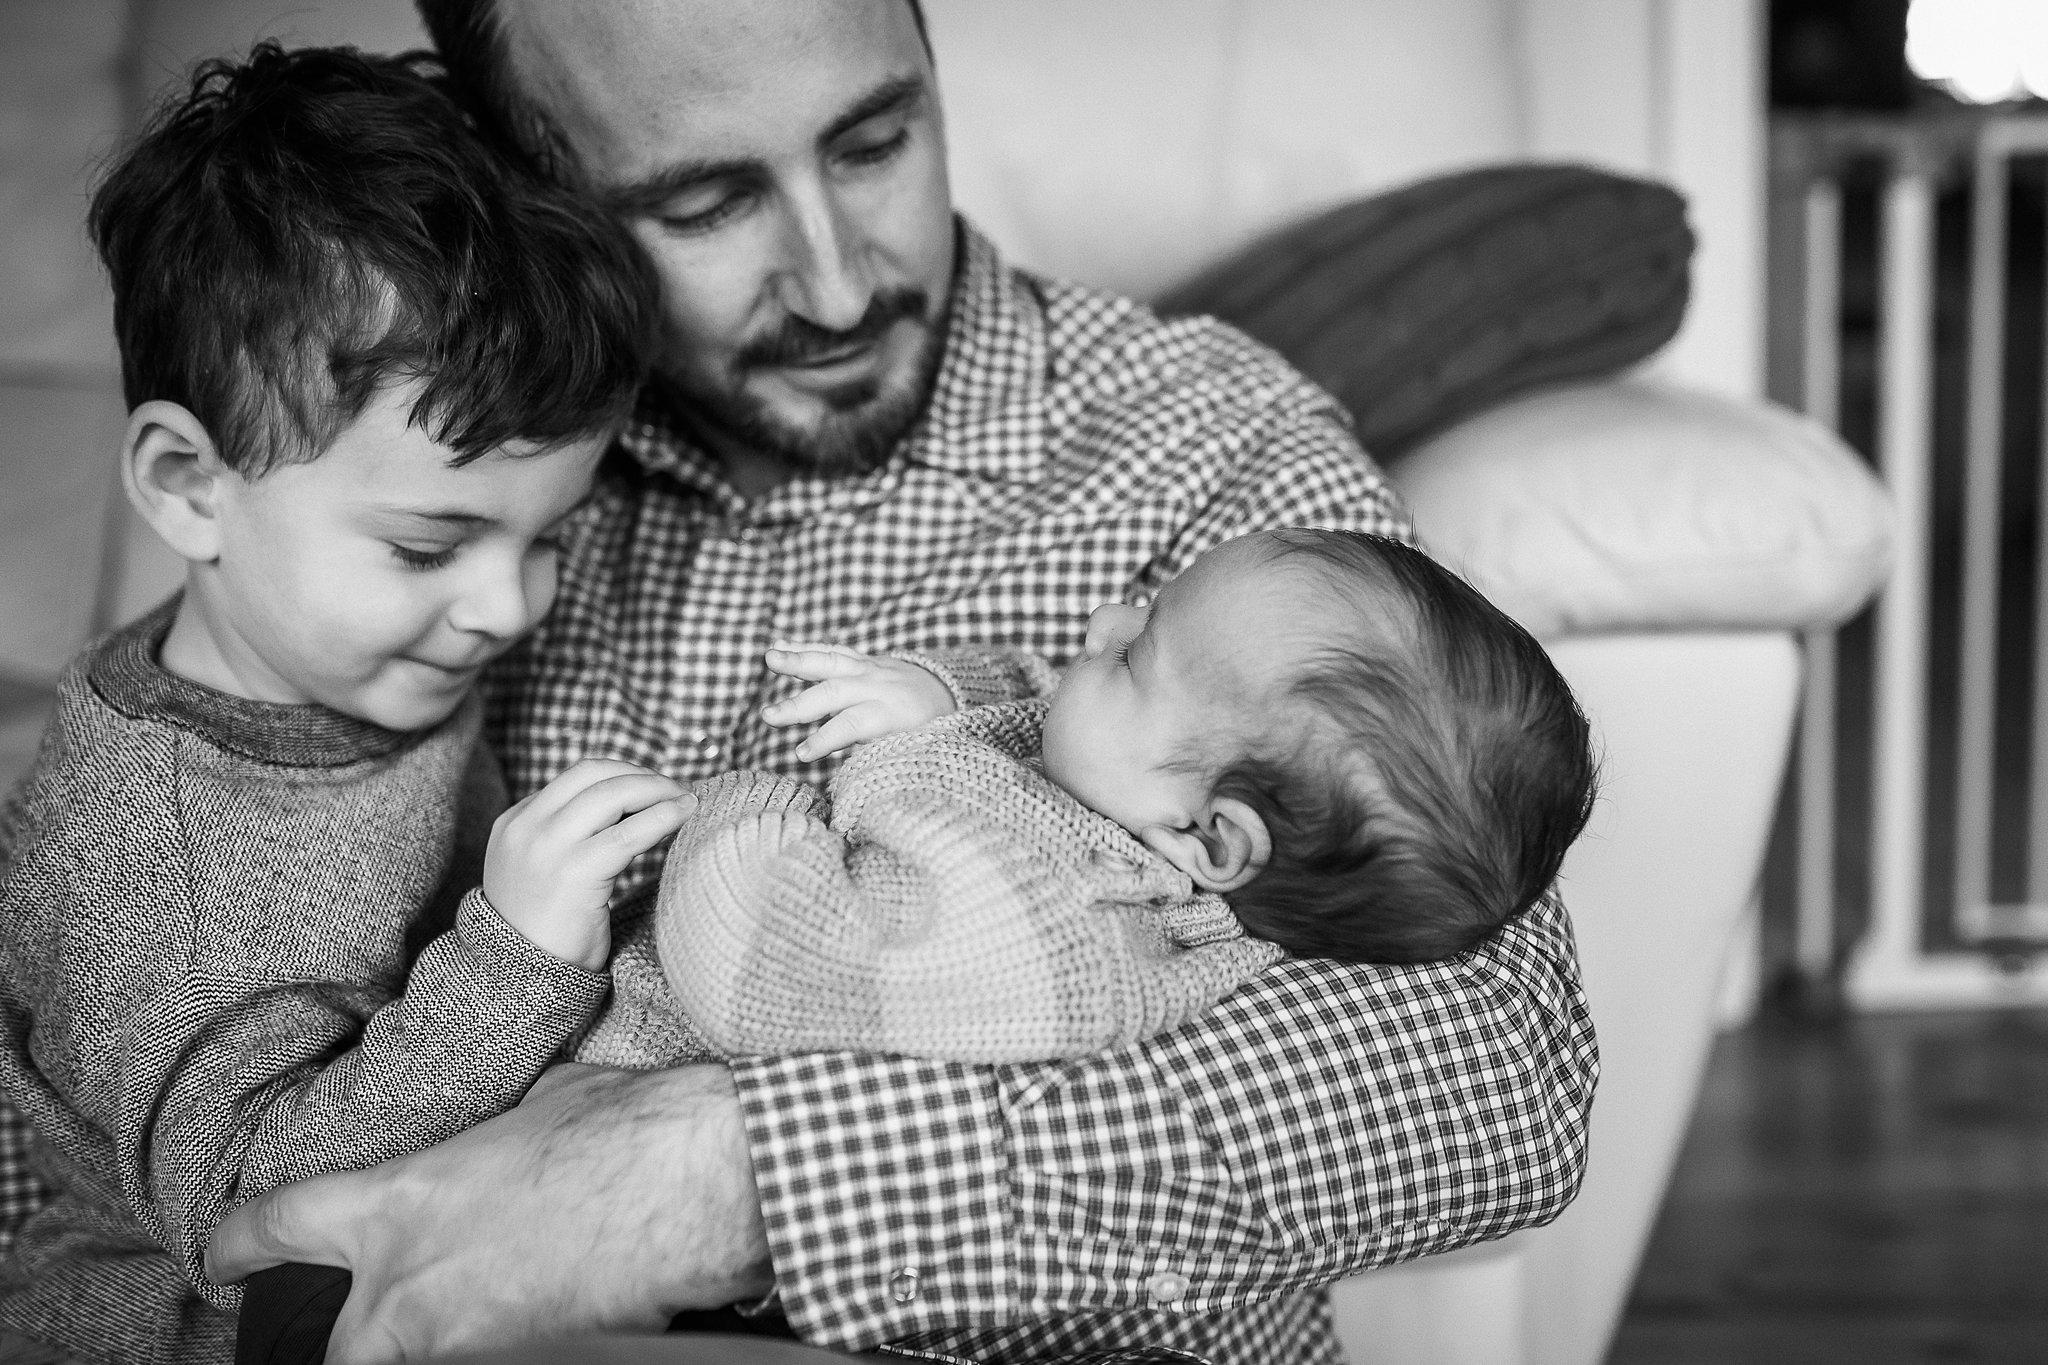 newborn-baby-in-home-family-photography-albury-wodonga-north-east-victoria (4).jpg